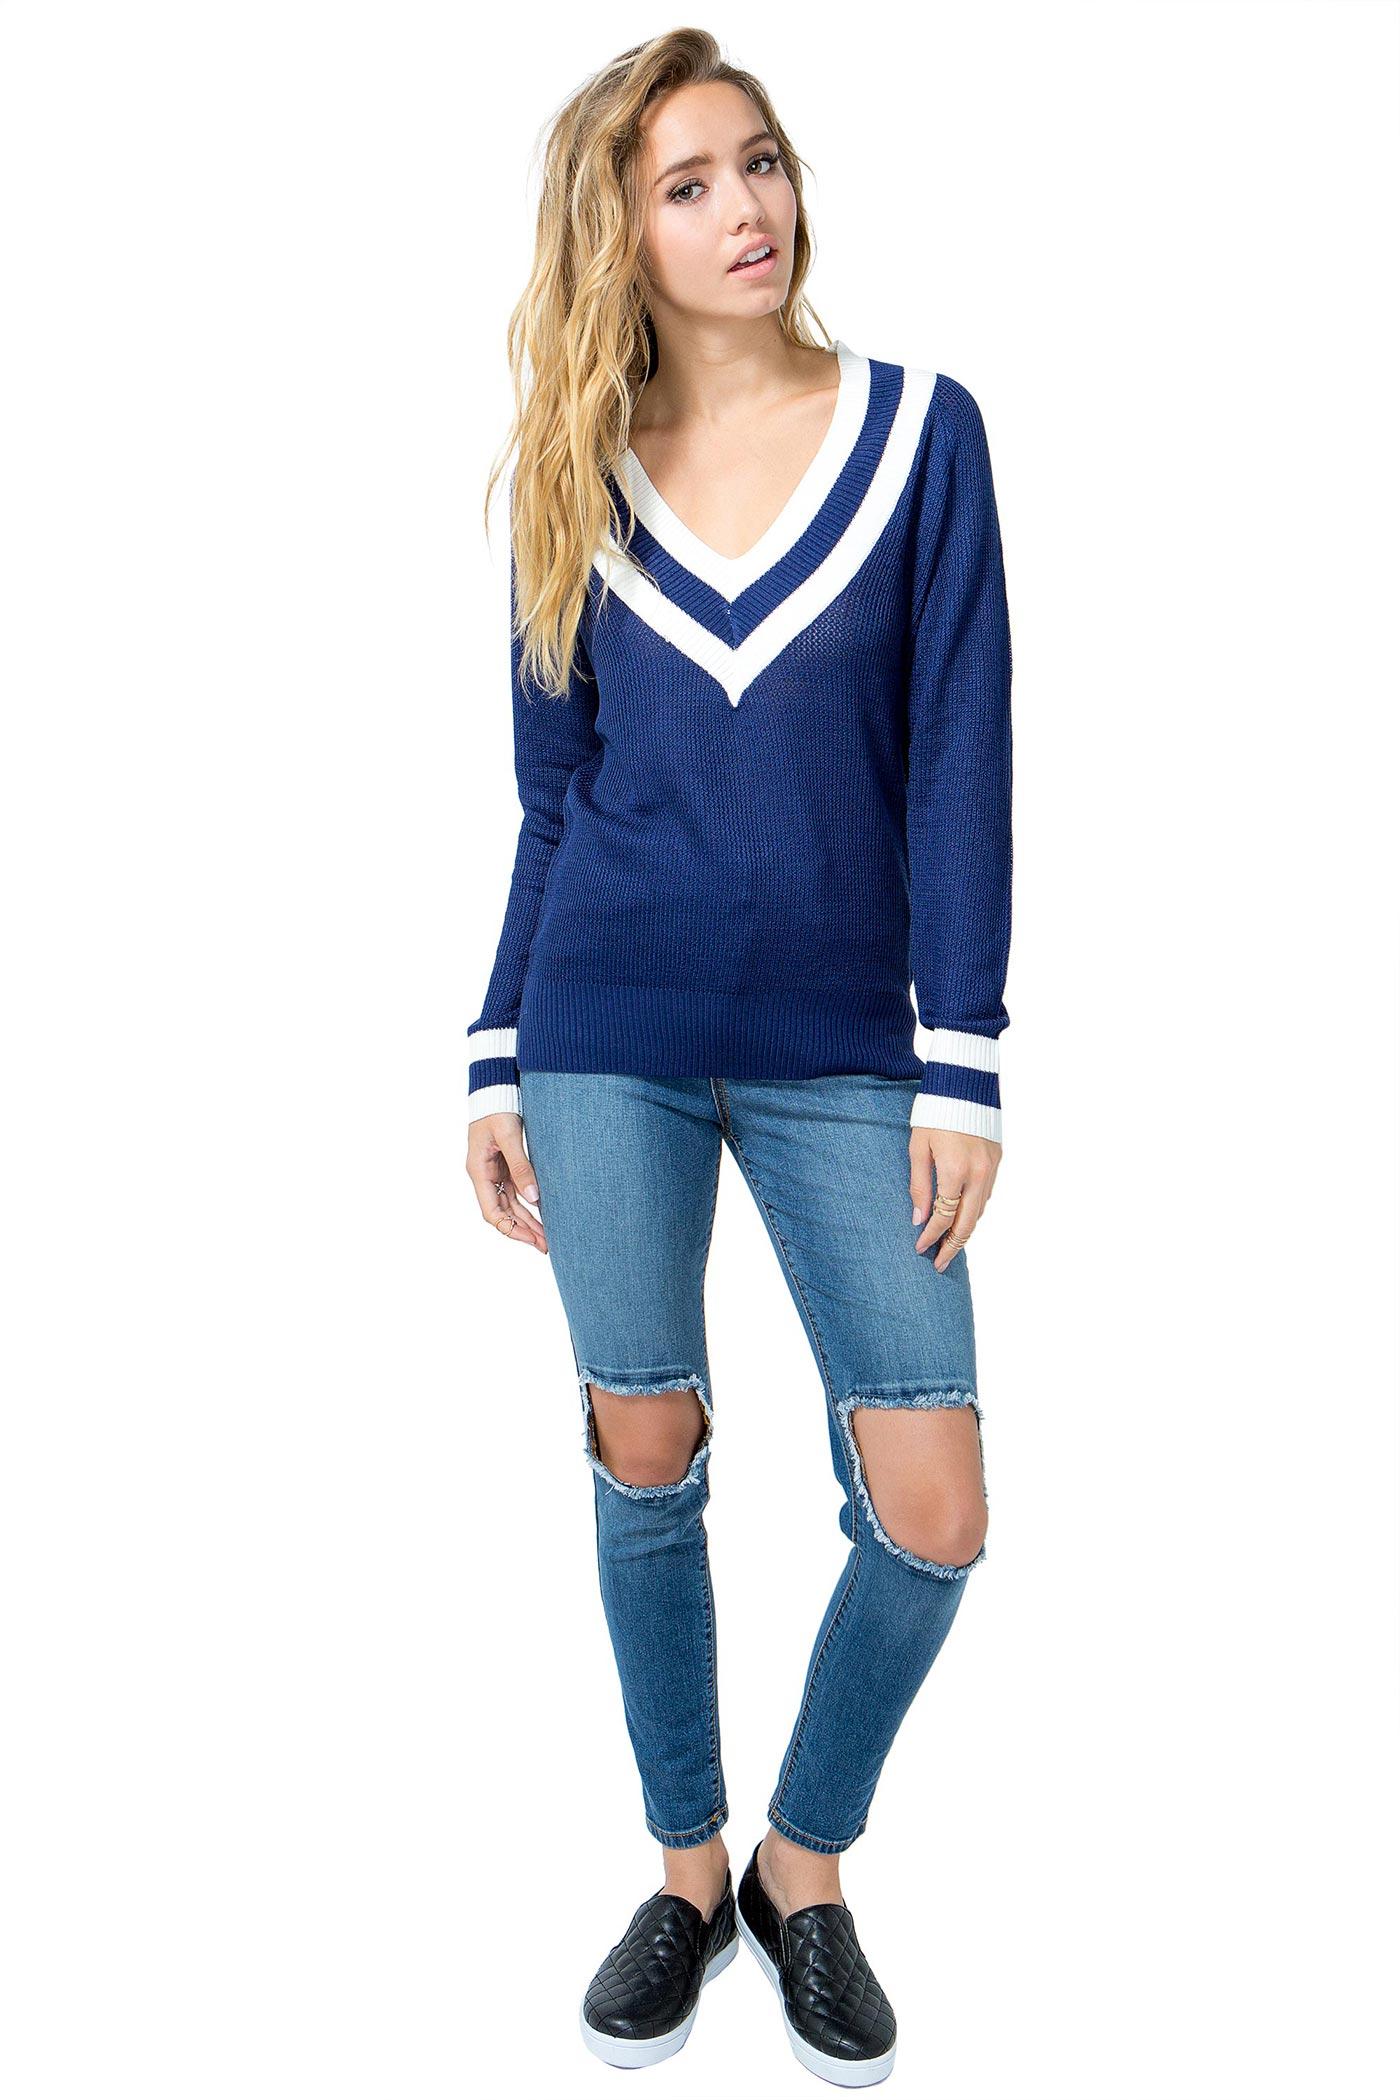 Women's Sweaters | Sharp Contrast Sweater | A'GACI